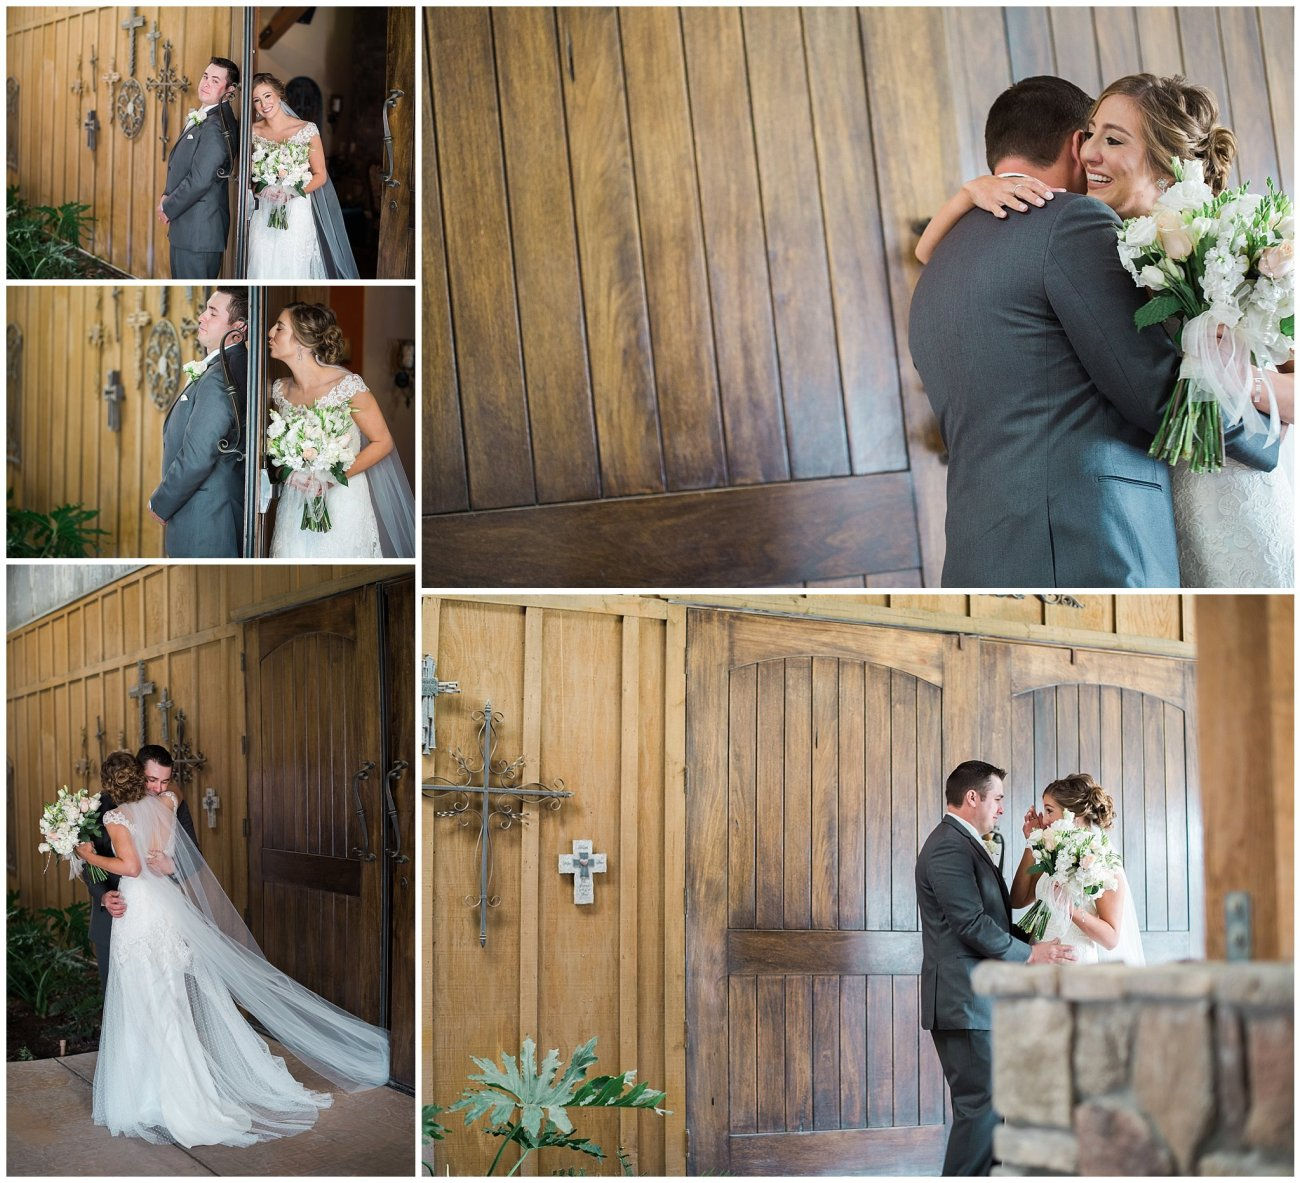 Kelcie & Devin Wedding Third Element Photography & Cinema Koetsier Ranch Visalia Tulare Fresno Hybrid Film Wedding Photographer_0013